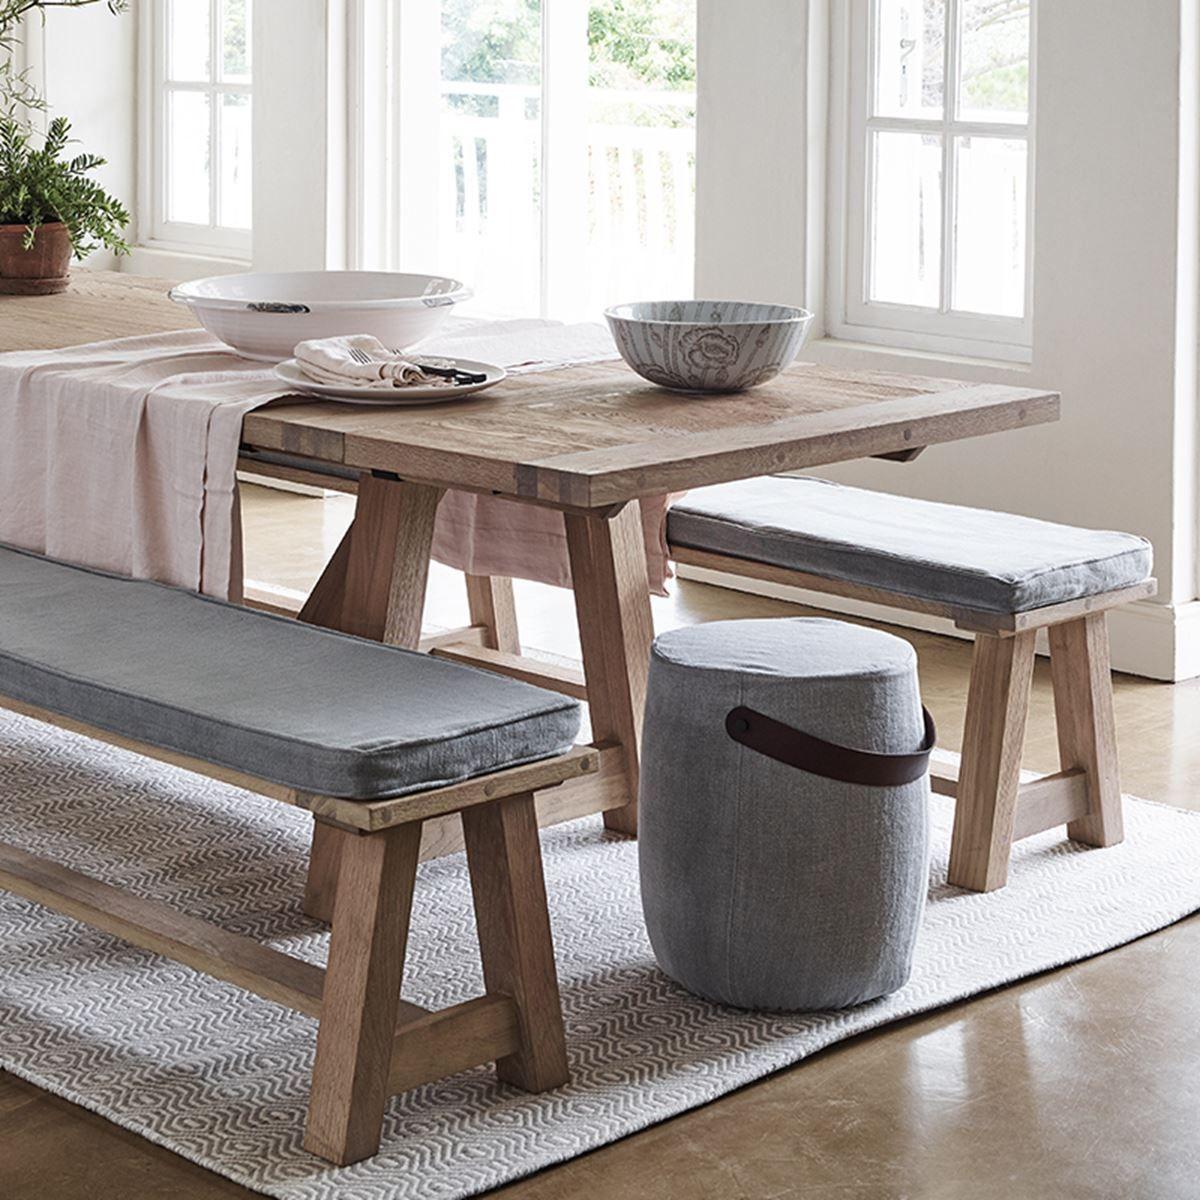 Arundel Rustic Oak Dining Table Uk Neptune Bingefashion Com Interior Oak Dining Table Rustic Oak Dining Table Rectangular Dining Table [ 1200 x 1200 Pixel ]